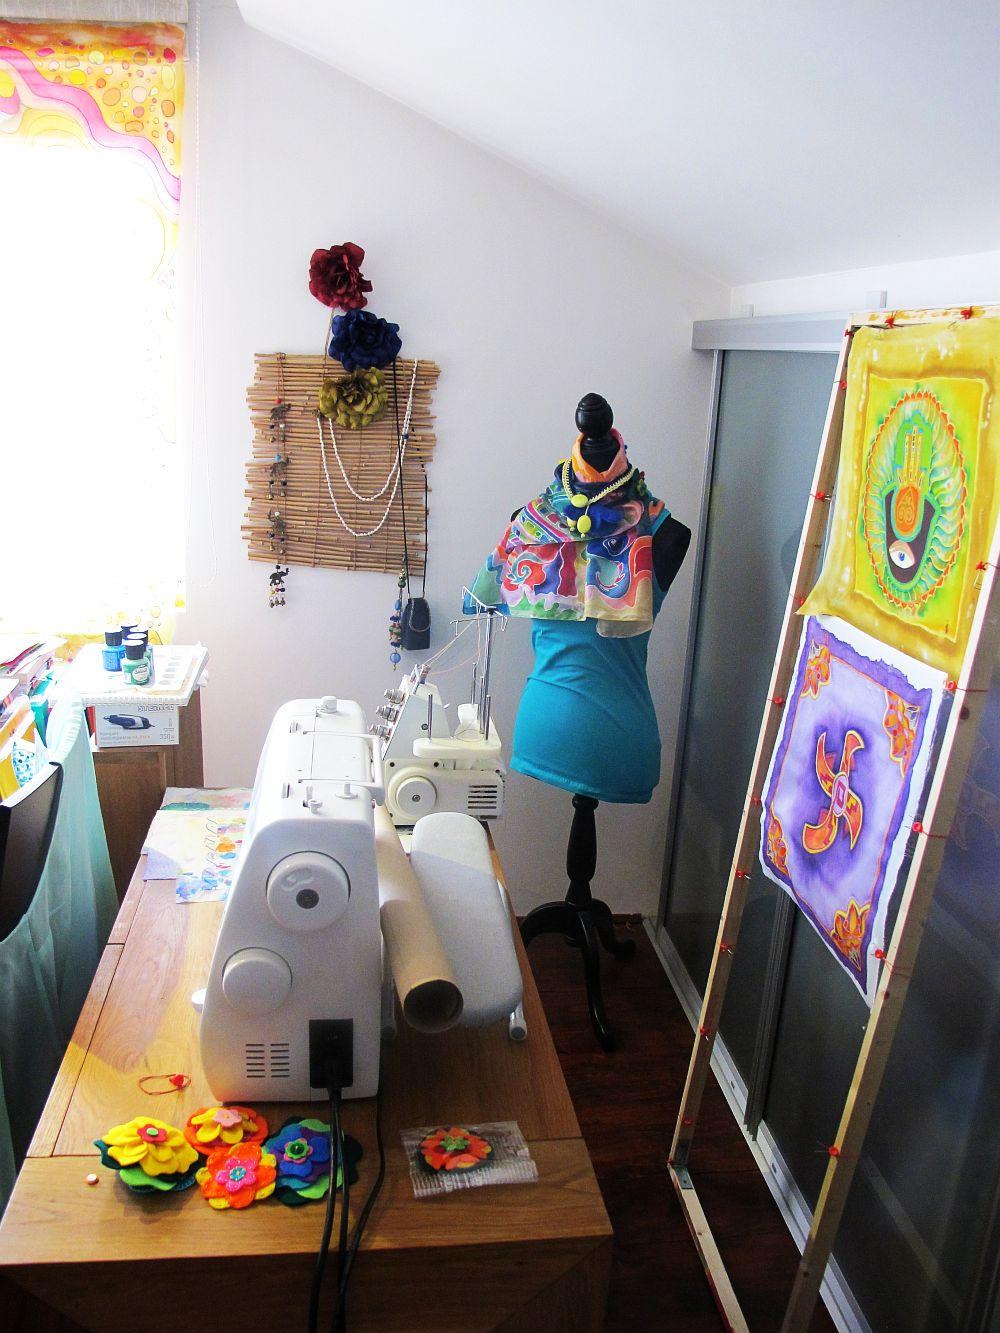 adelaparvu.com about Ioana Dominte artist (12)